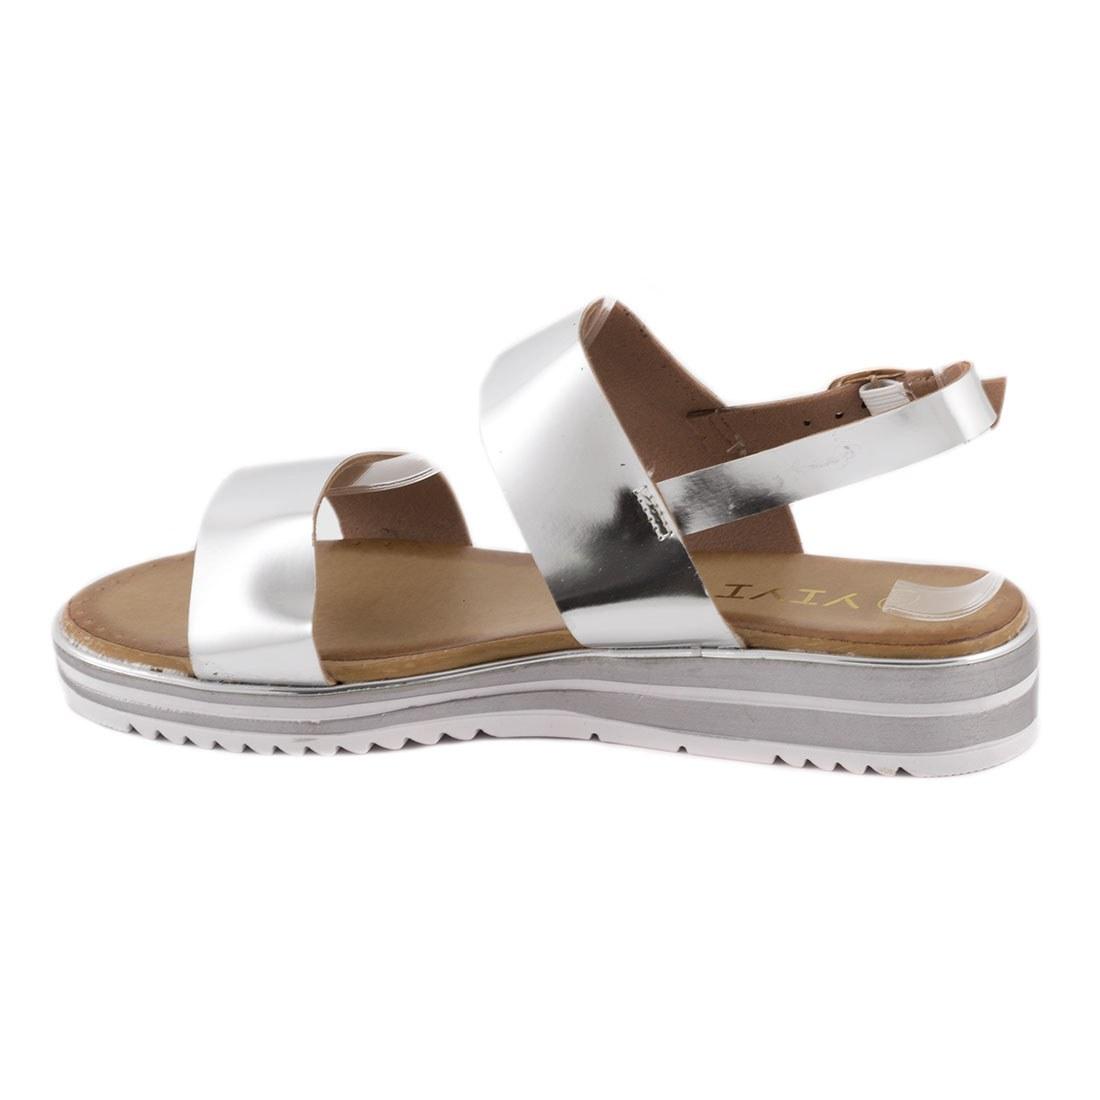 Sandale dama comode K-5-SILVER